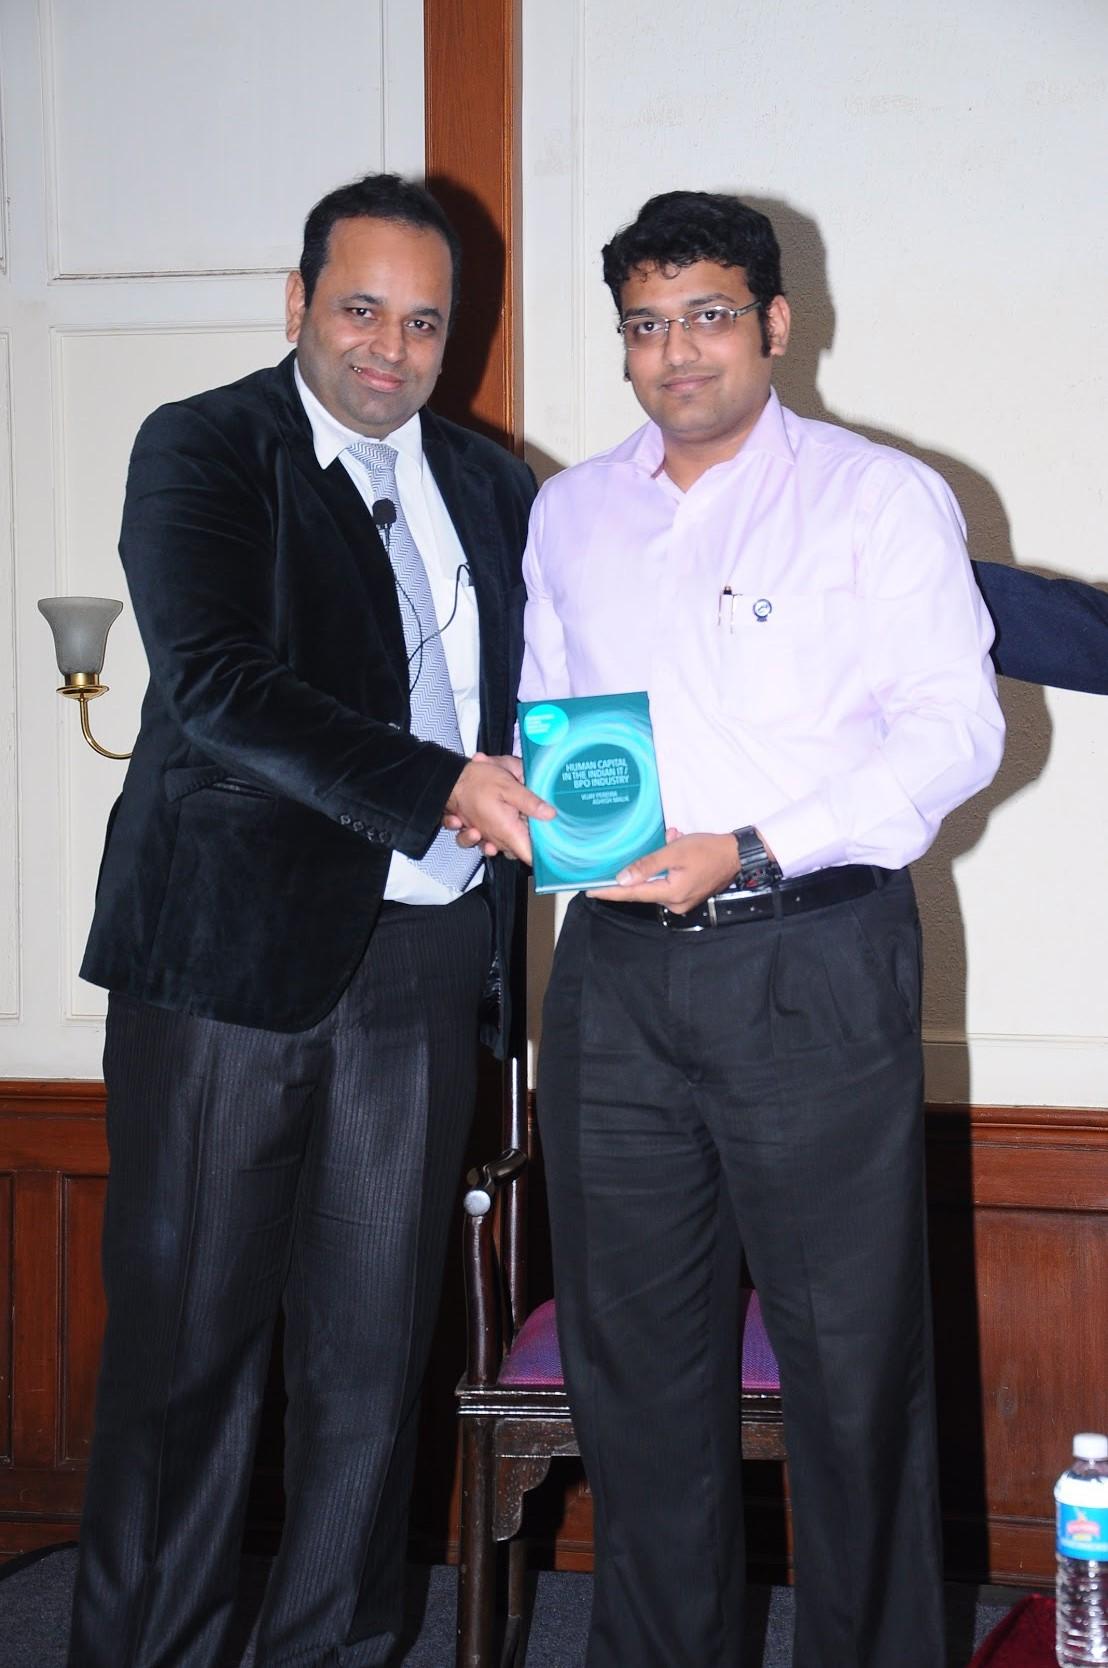 Dr Ashish Malik Launches Books Internationally, University of Newcastle